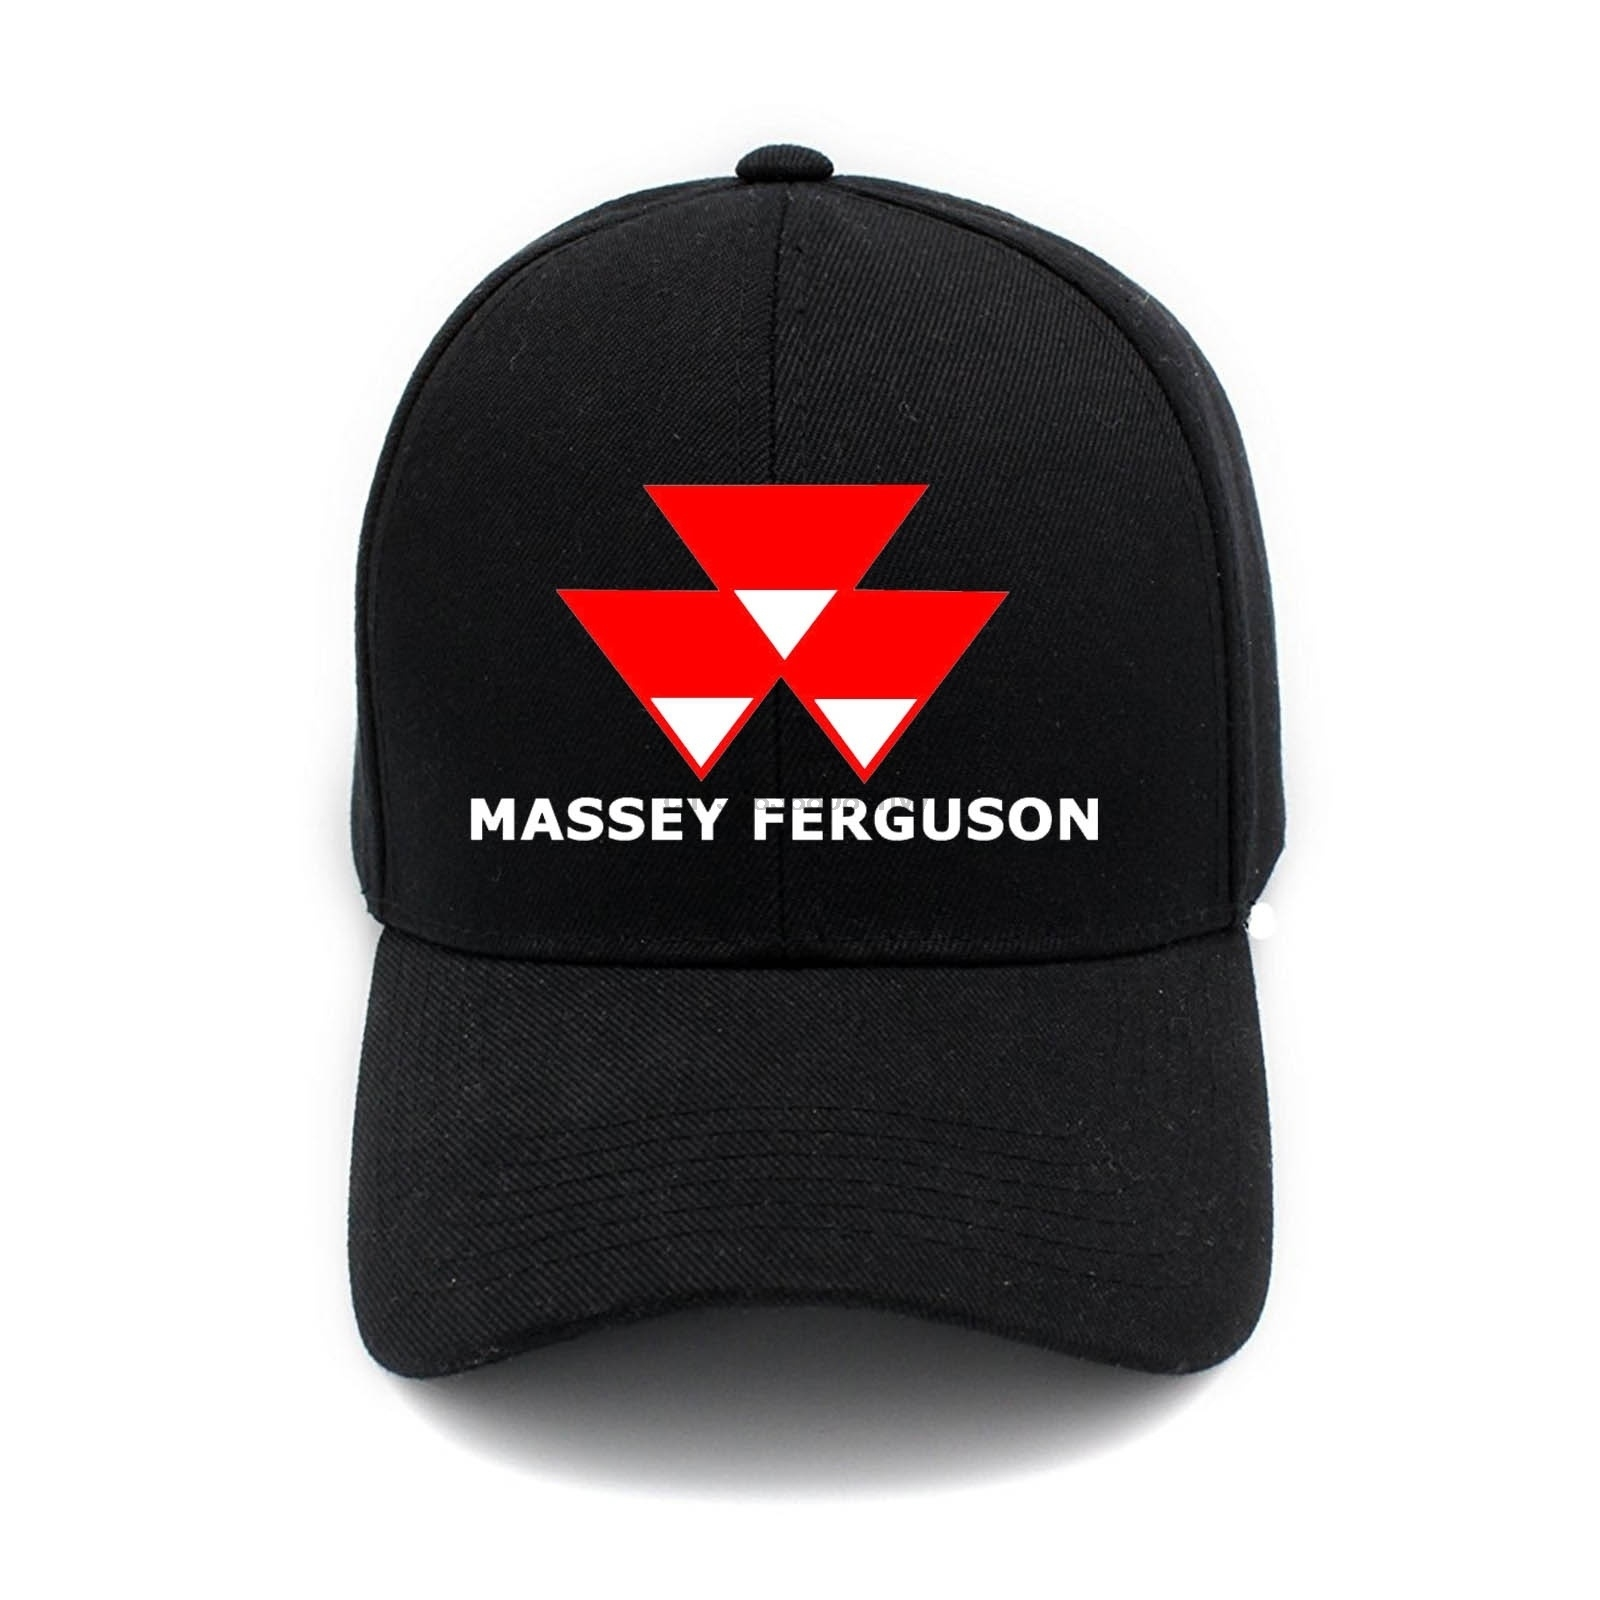 Massey Ferguson Adjustable Baseball Cap Casual Hat